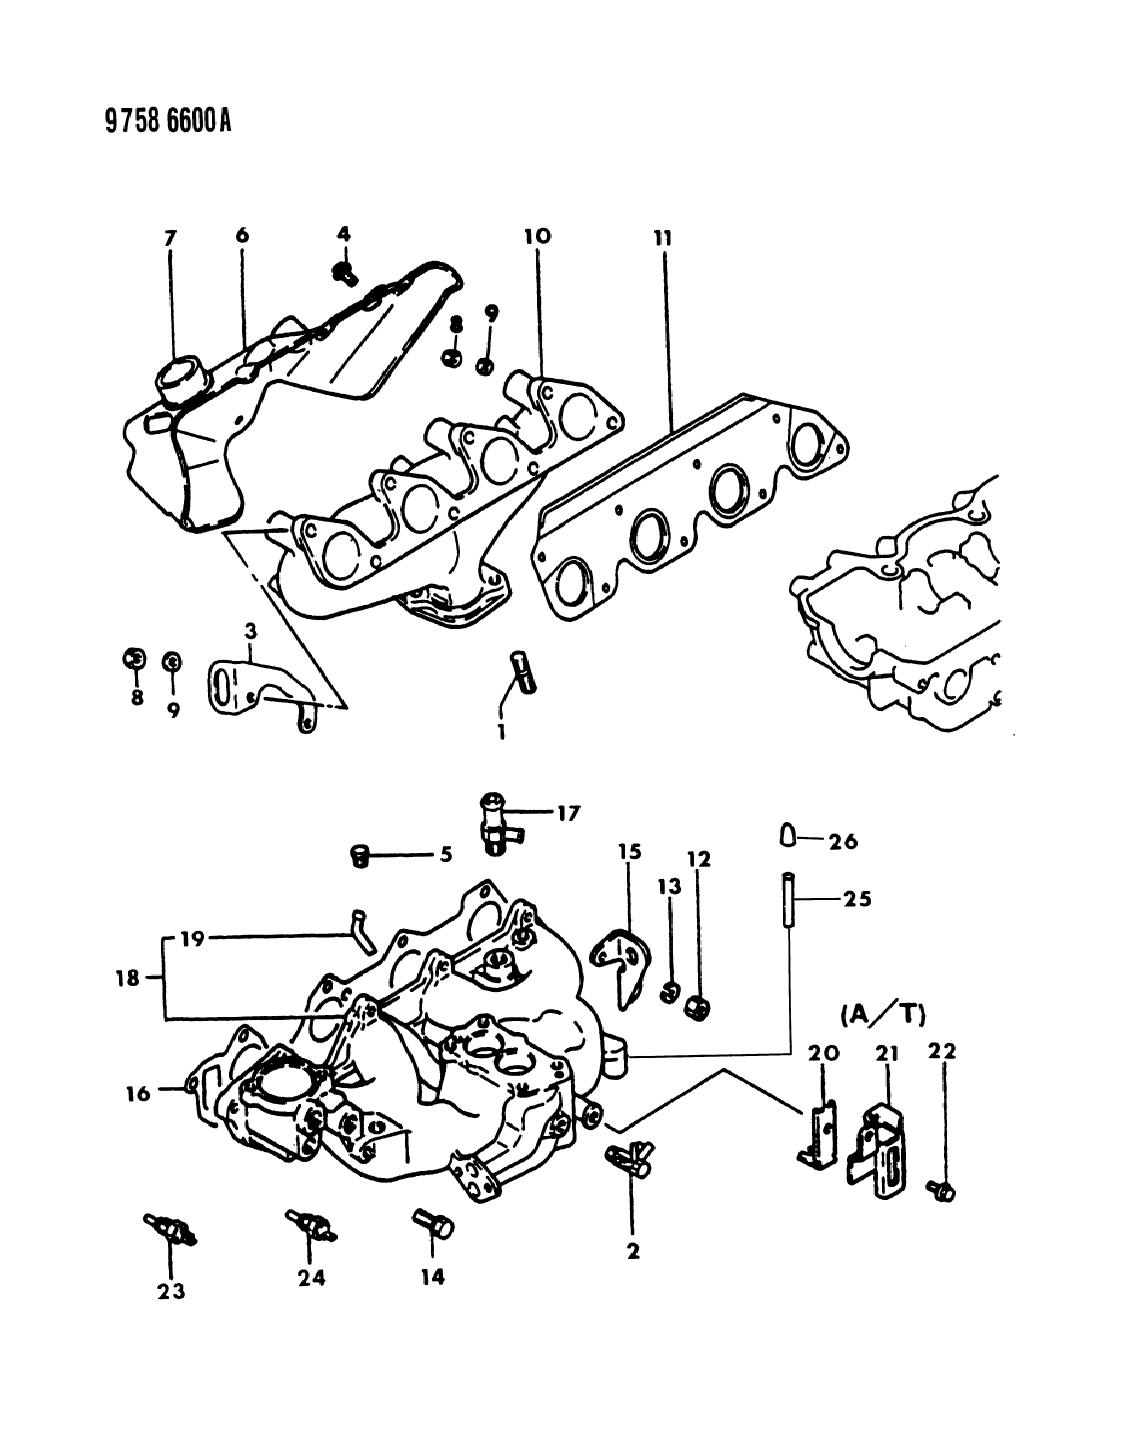 1989 Dodge Ram 50 Manifold Intake Exhaust Mopar Parts Giant 318 Engine Fuel System Diagram